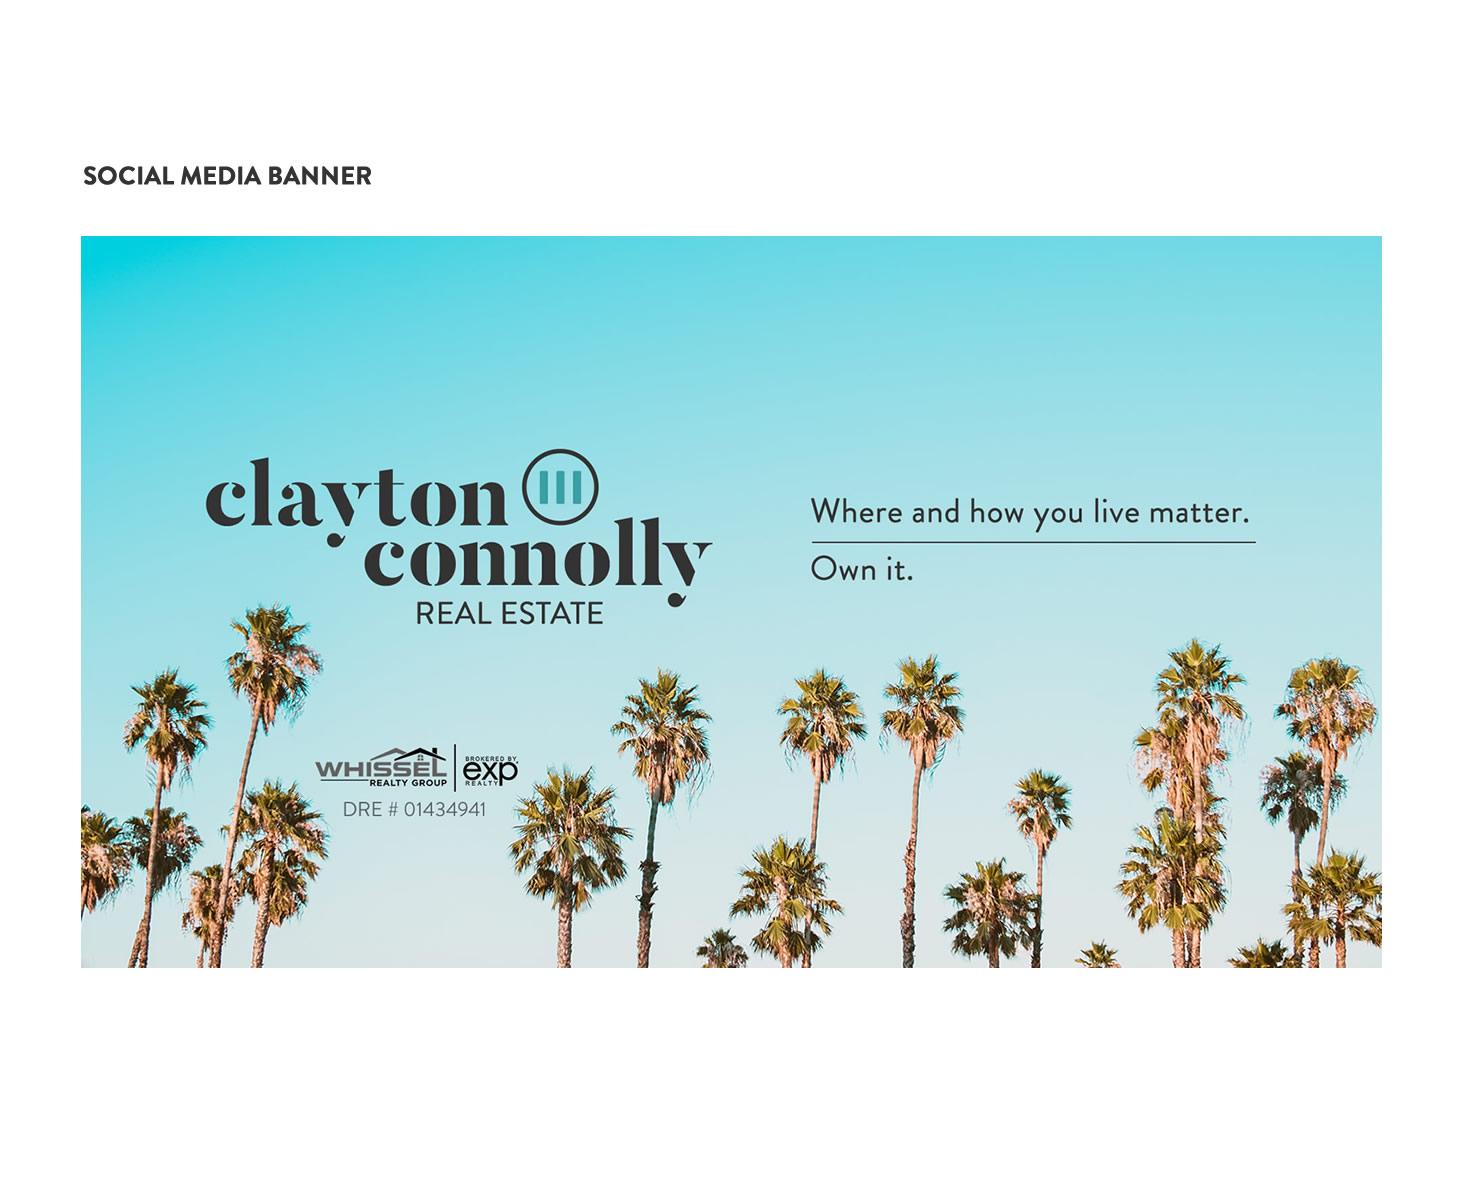 clayton_1